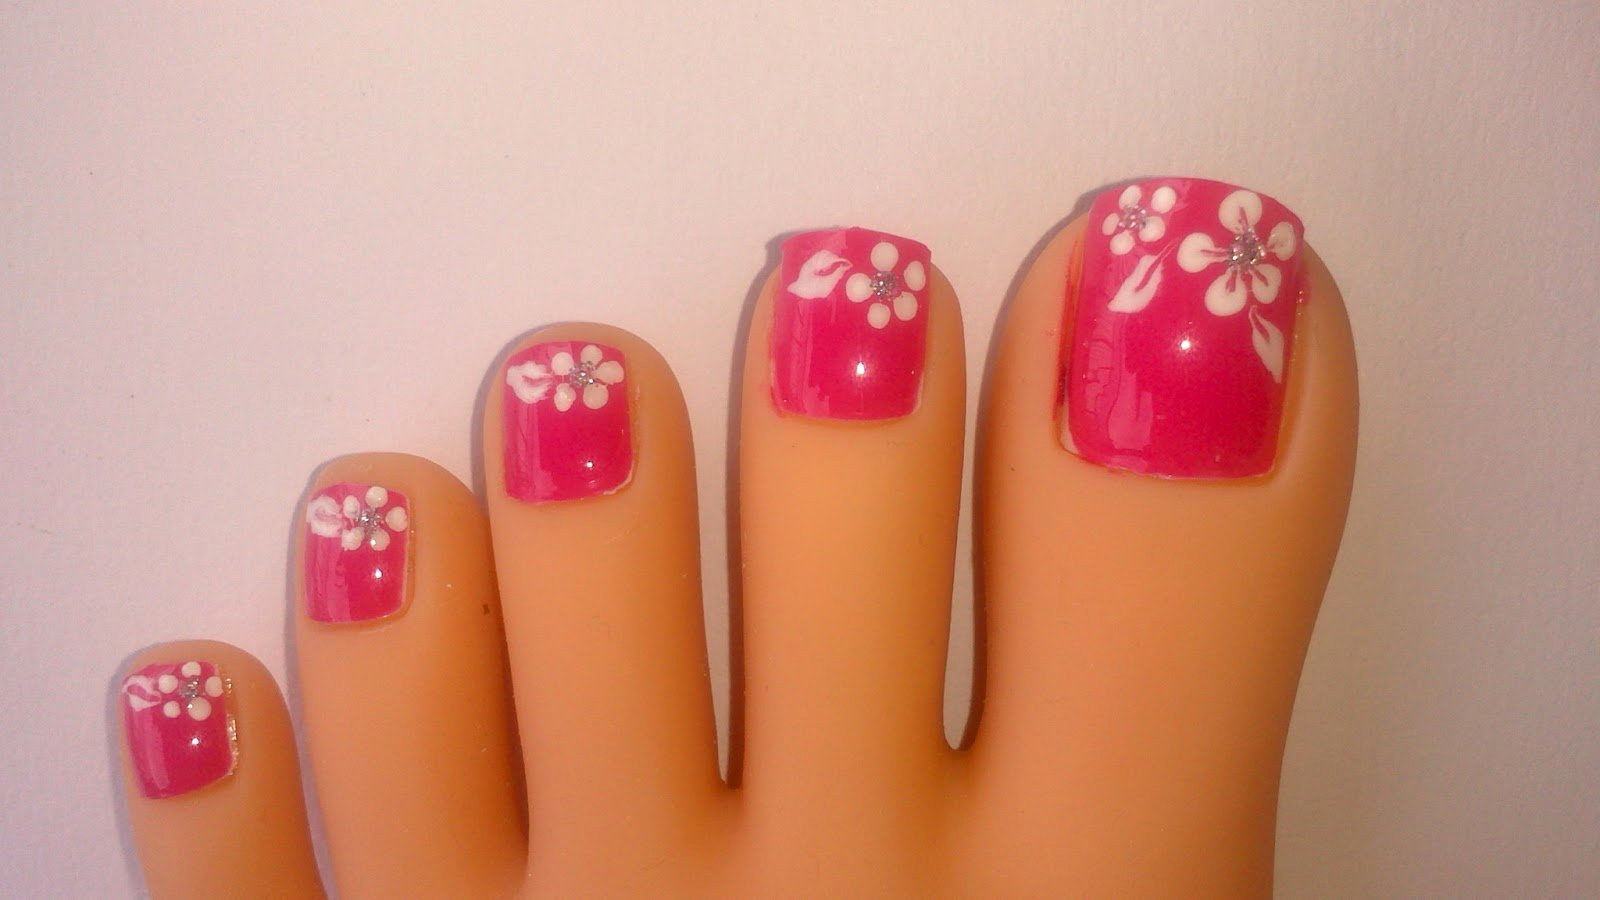 Toes Nails Design Pictures Unique Lnetsa S Nailart toe Nail Design Short Nails Version